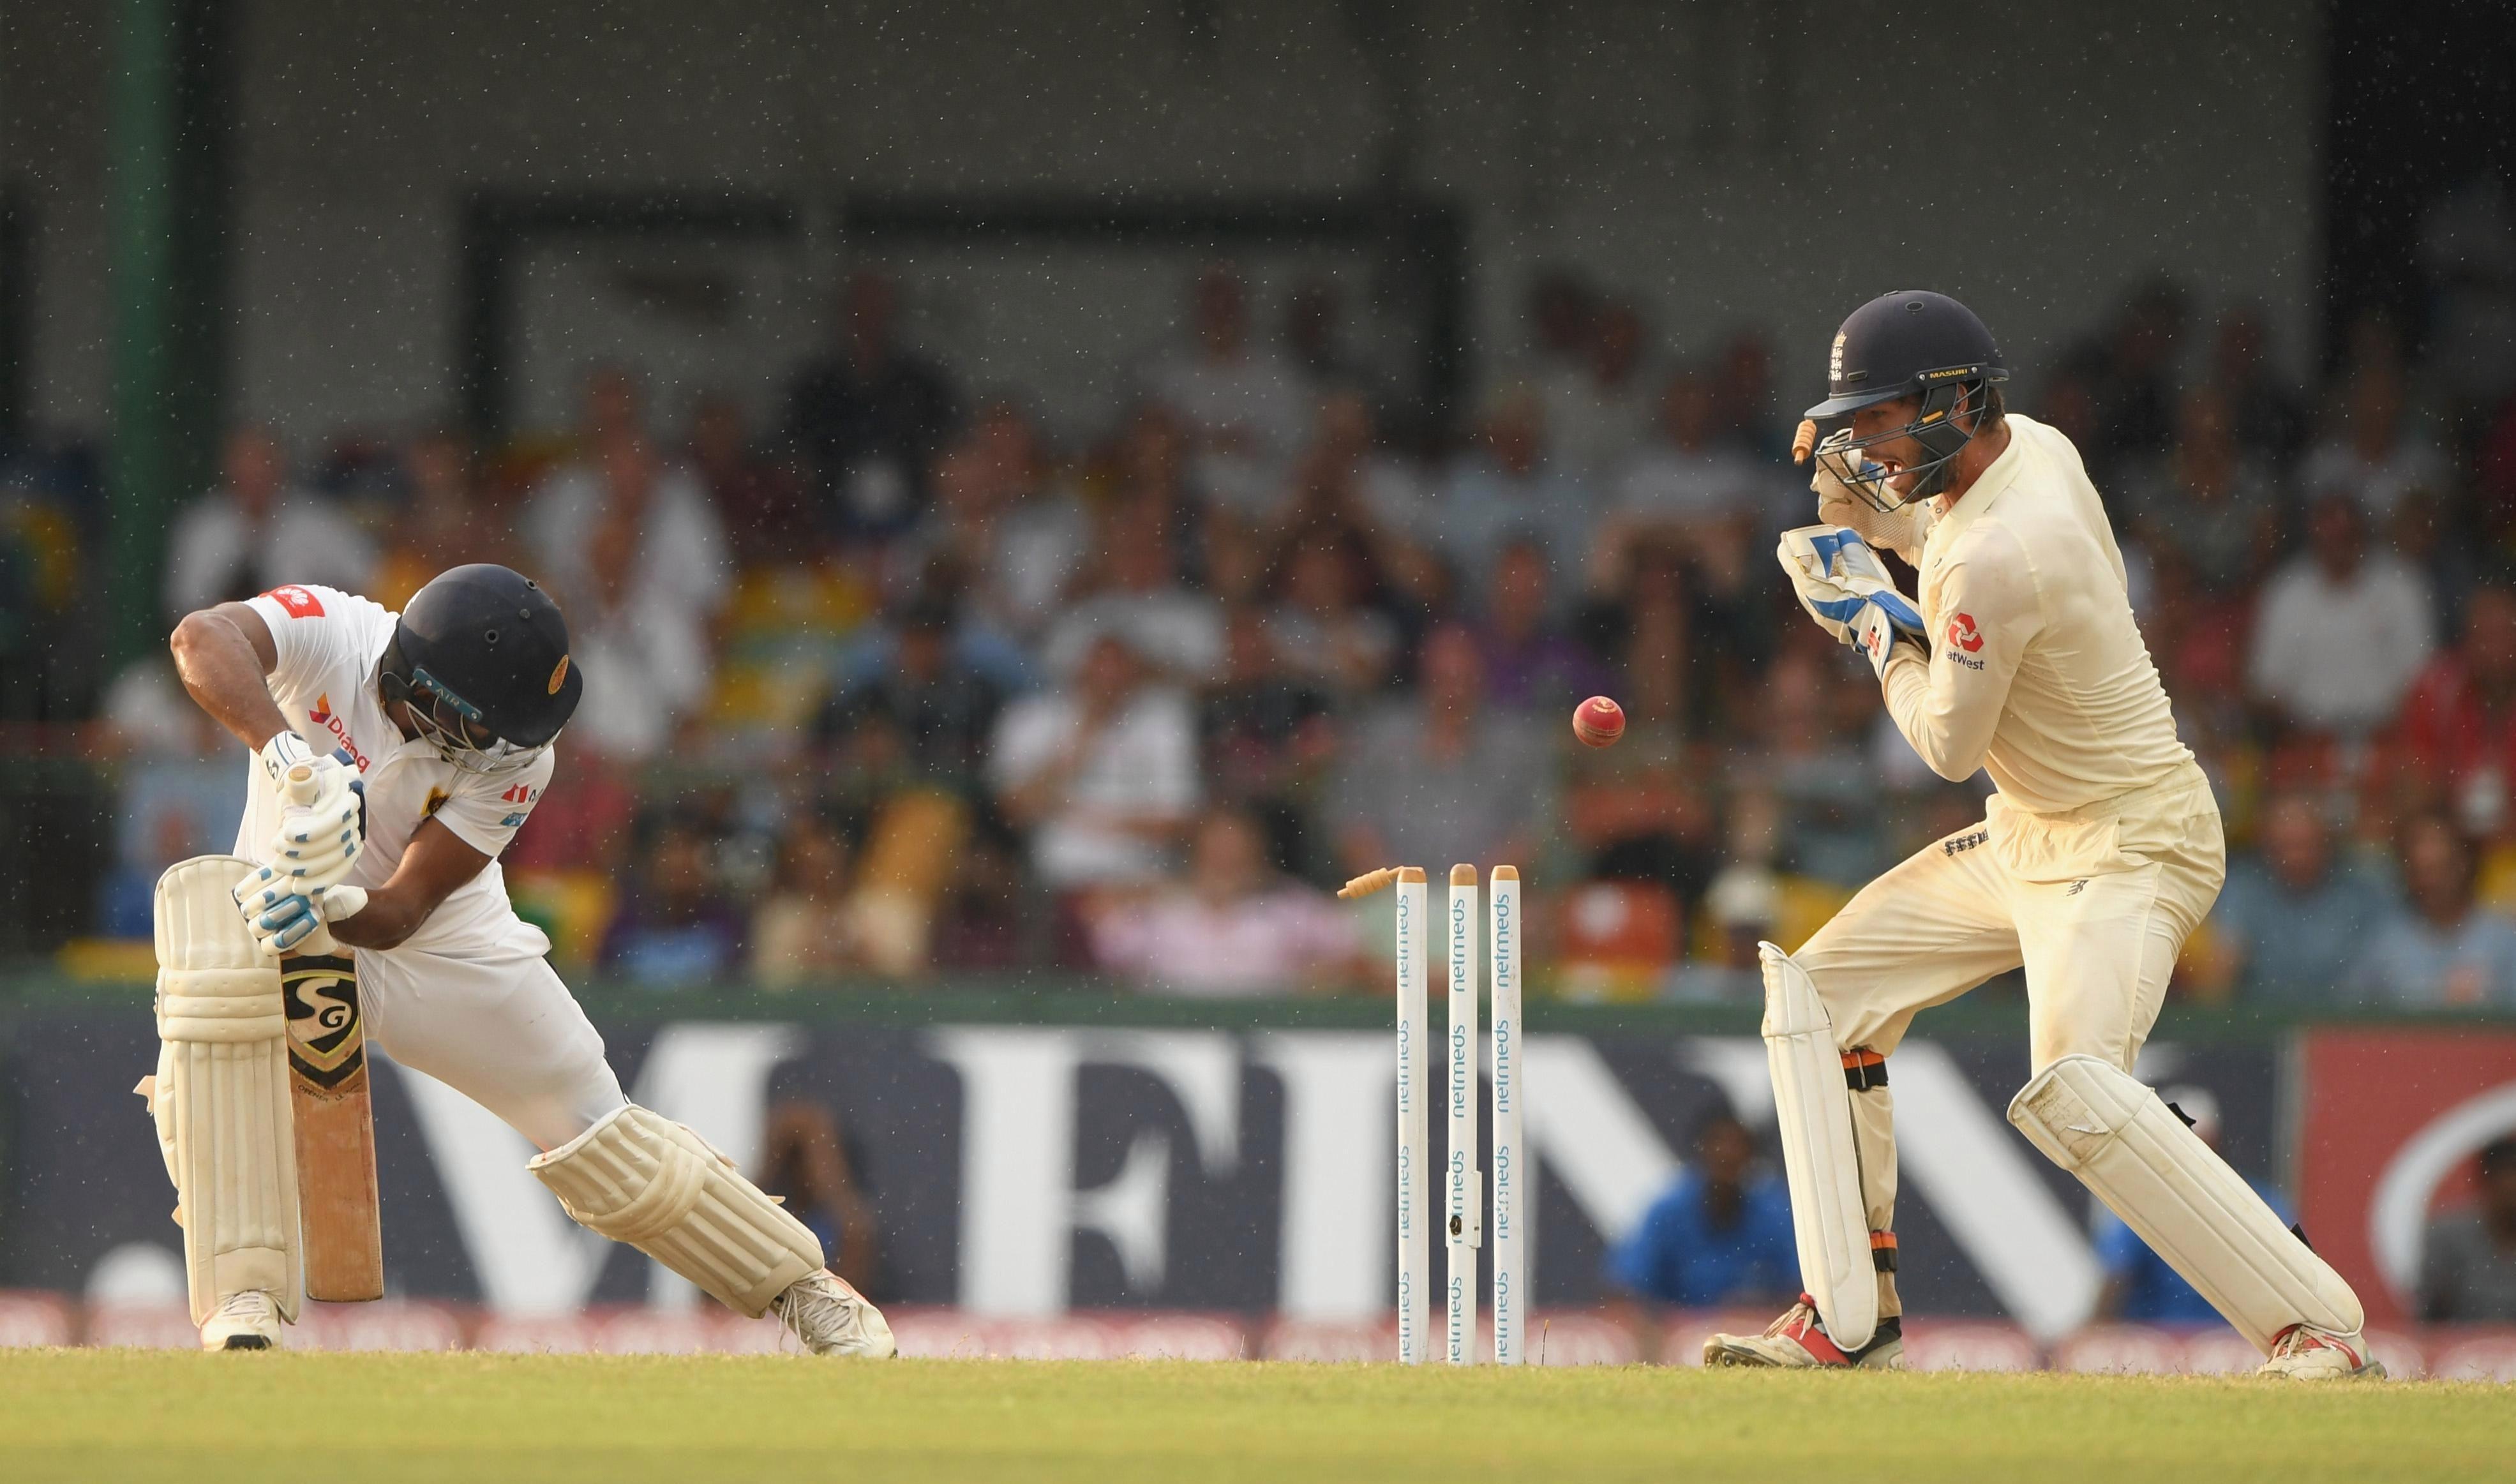 England rattled through Sri Lanka's top order late on day three